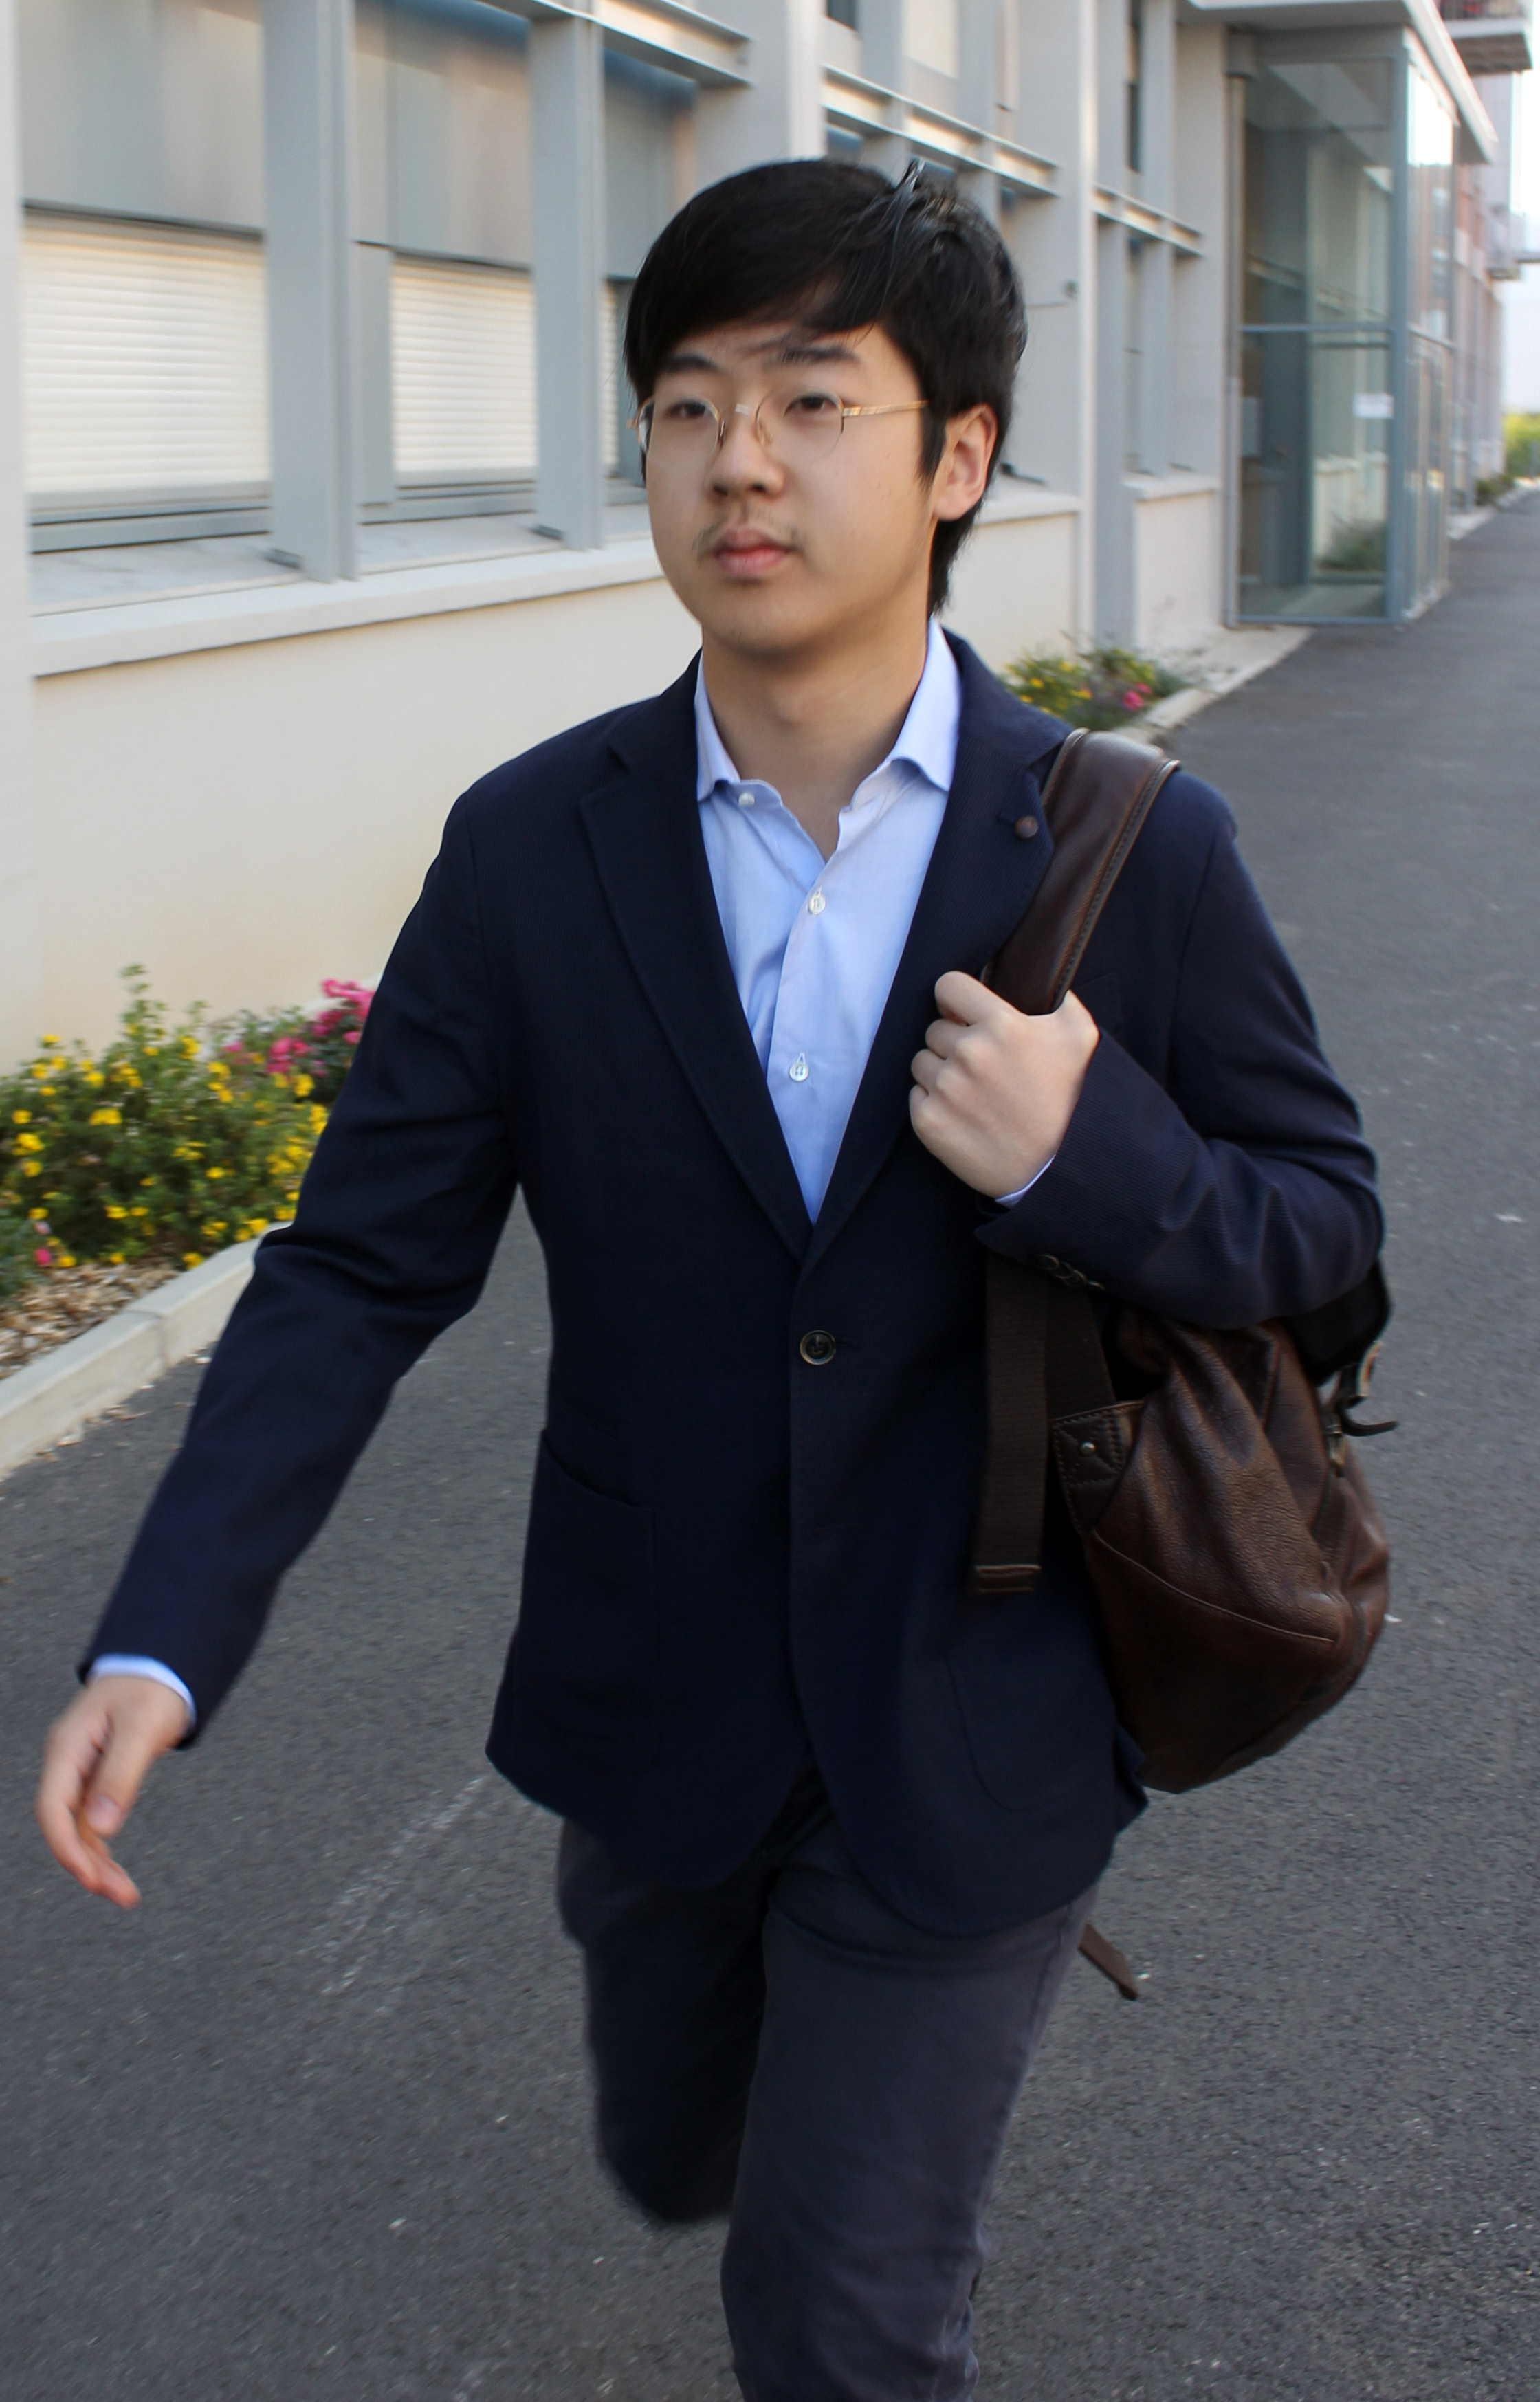 NK leader''s half brother assassination